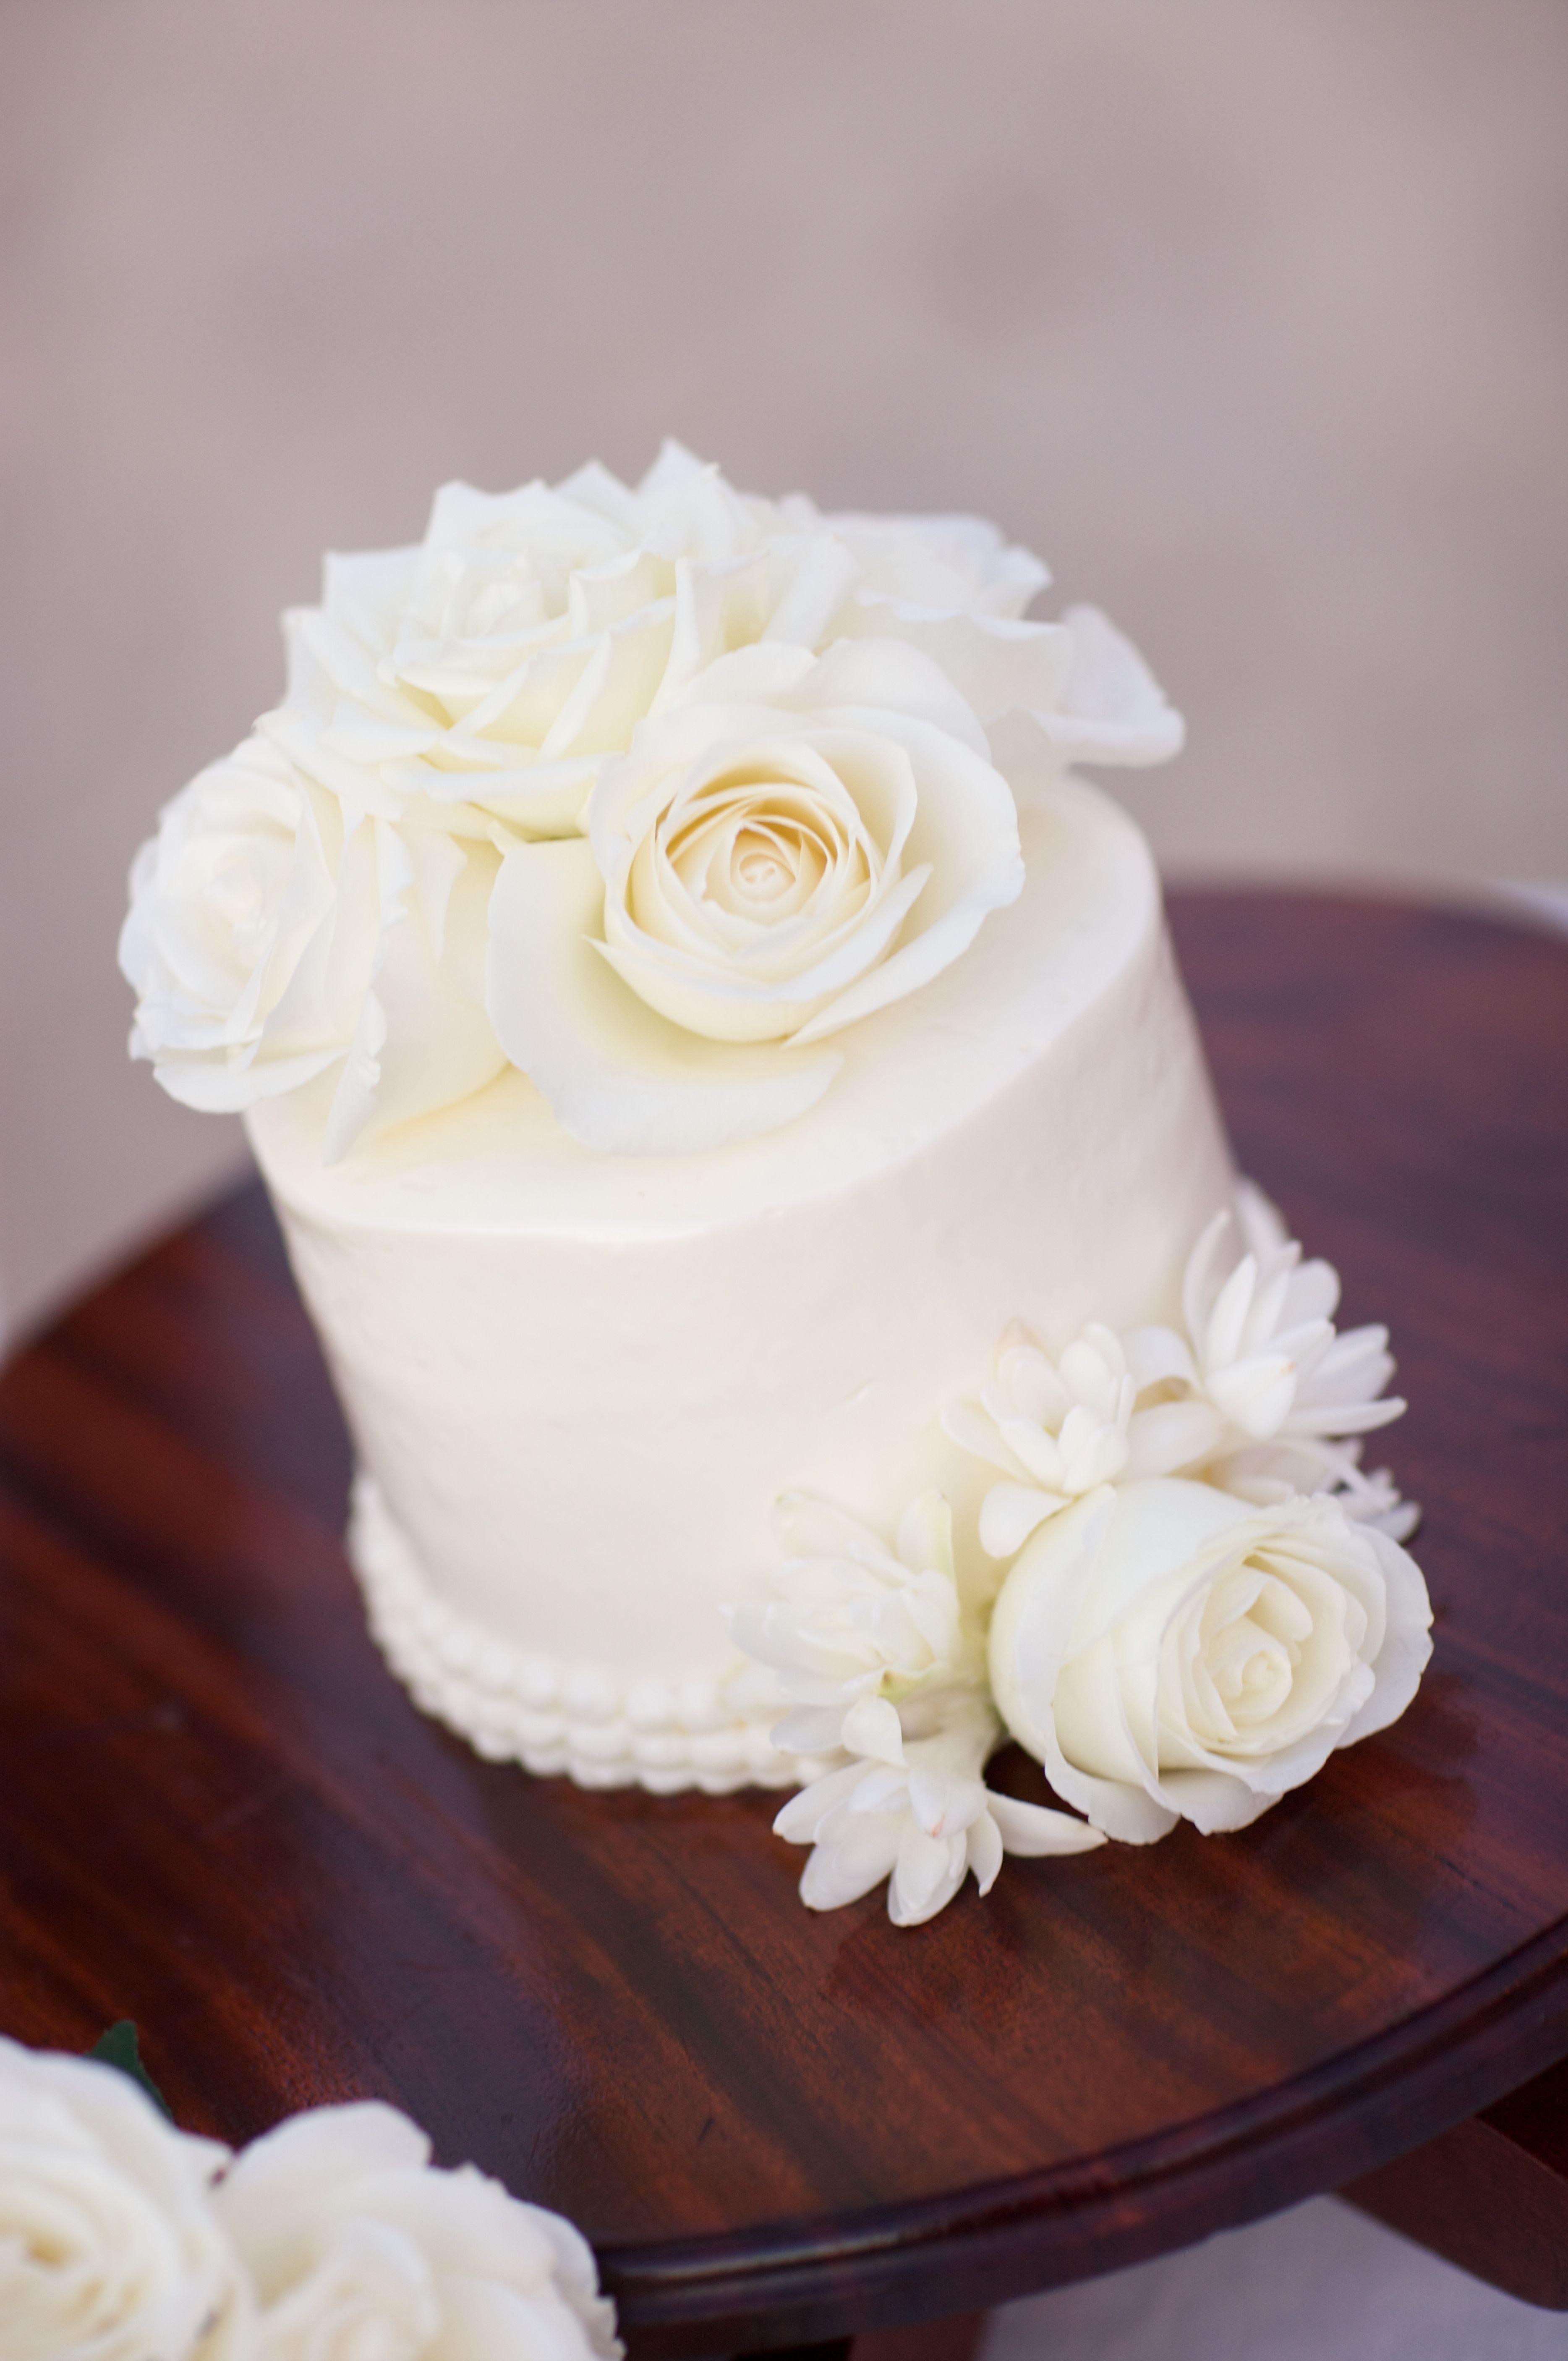 Pin By Four Seasons Resort Hualalai W On Cakes Simple Wedding Cake Wedding Cakes One Tier Small Wedding Cakes